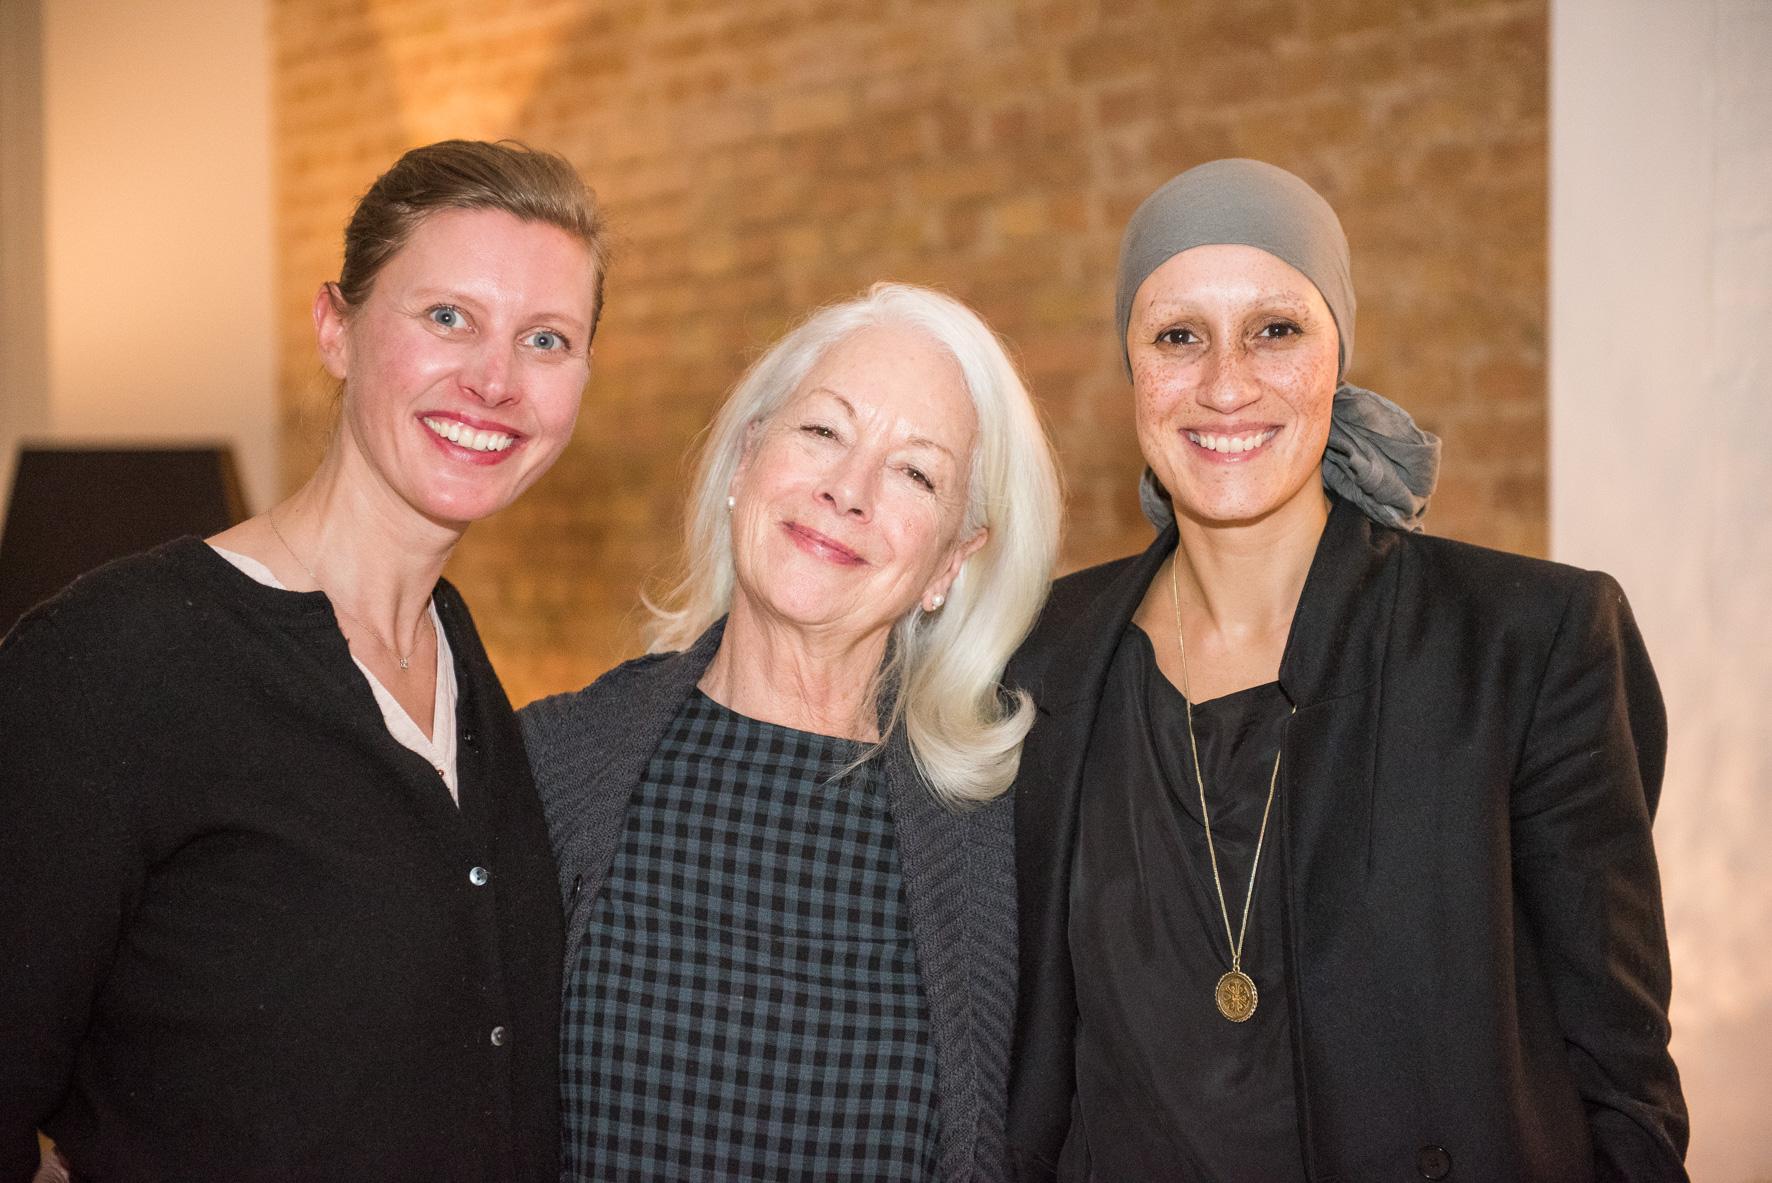 Raphaela Cochet, Scilla Elworthy & Yasmine Orth